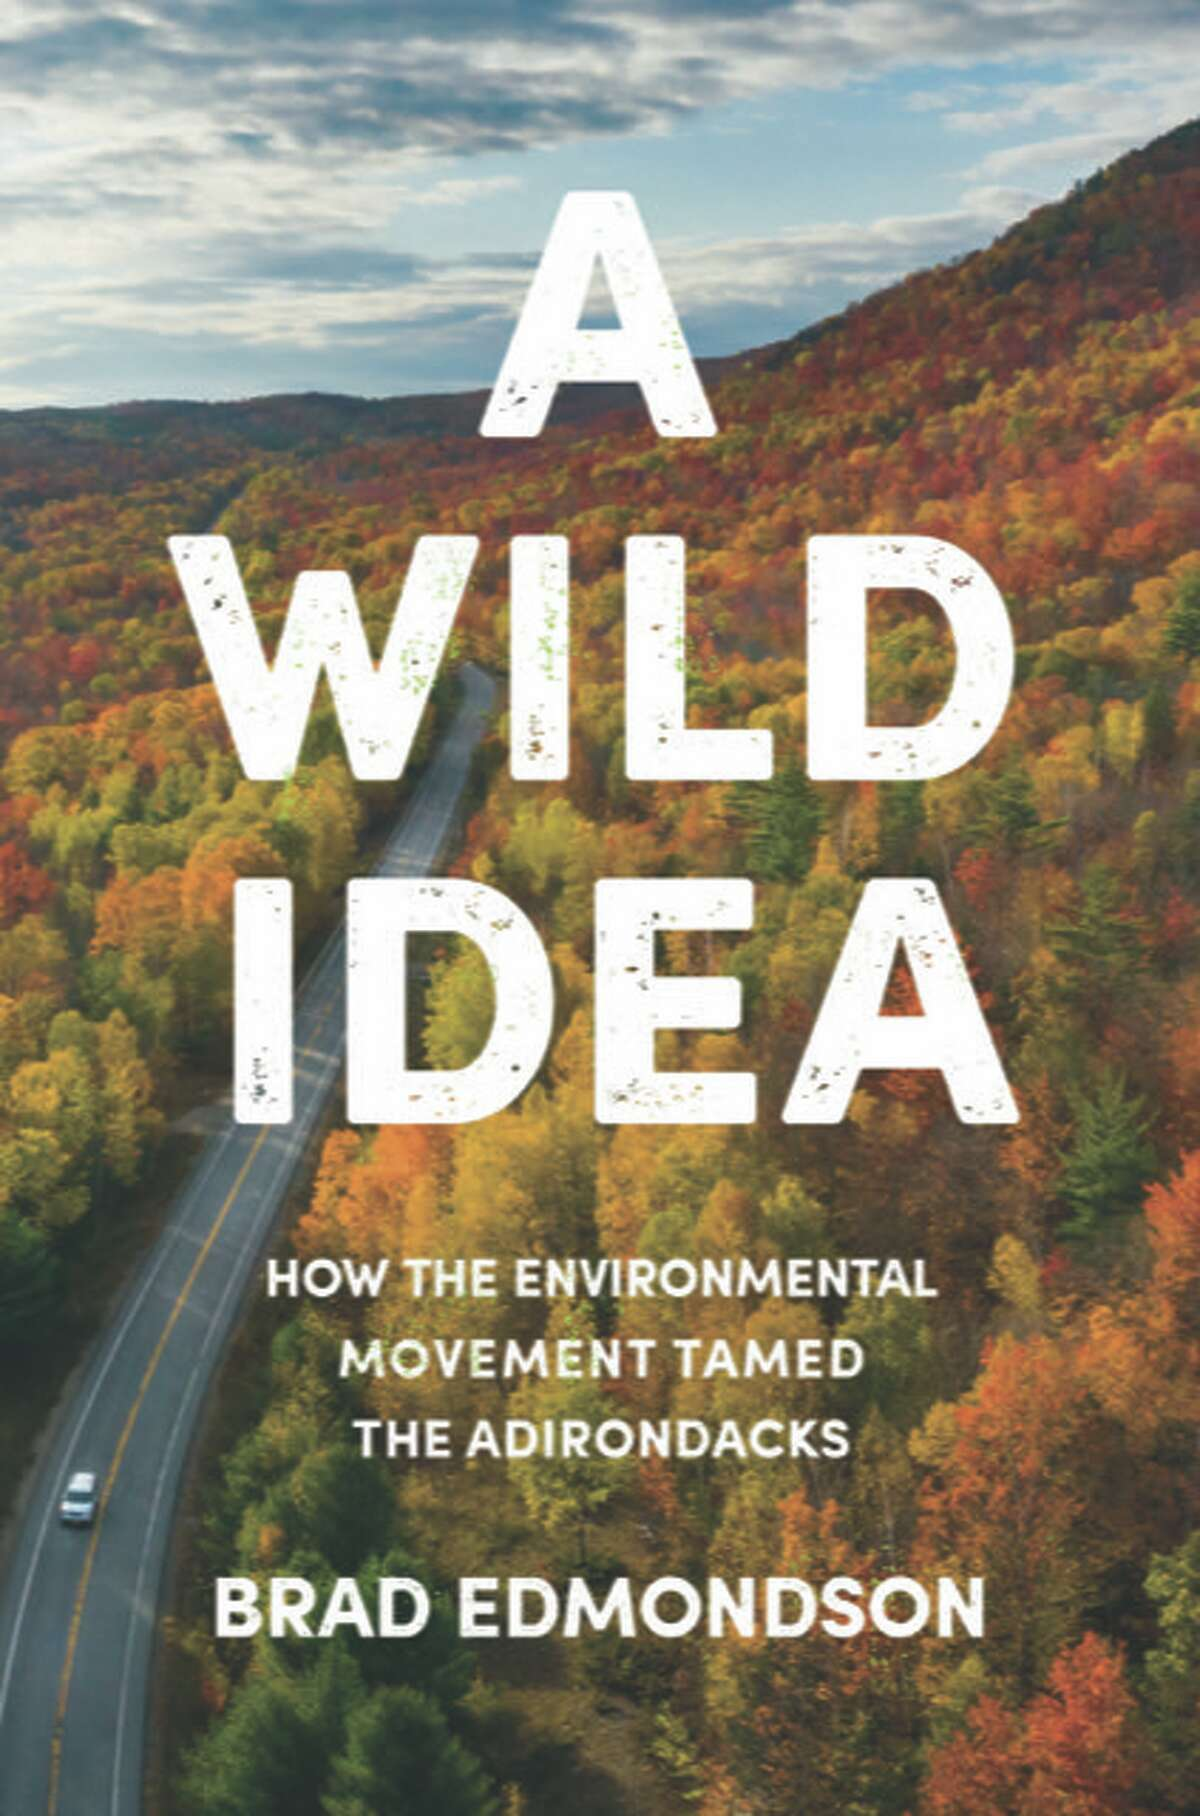 "Brad Edmondson's new book, ""A Wild Idea: How the Environmental Movement Tamed the Adirondacks"" (Cornell University Press) details the difficult process behind the establishment of the Adirondack Park Agency."